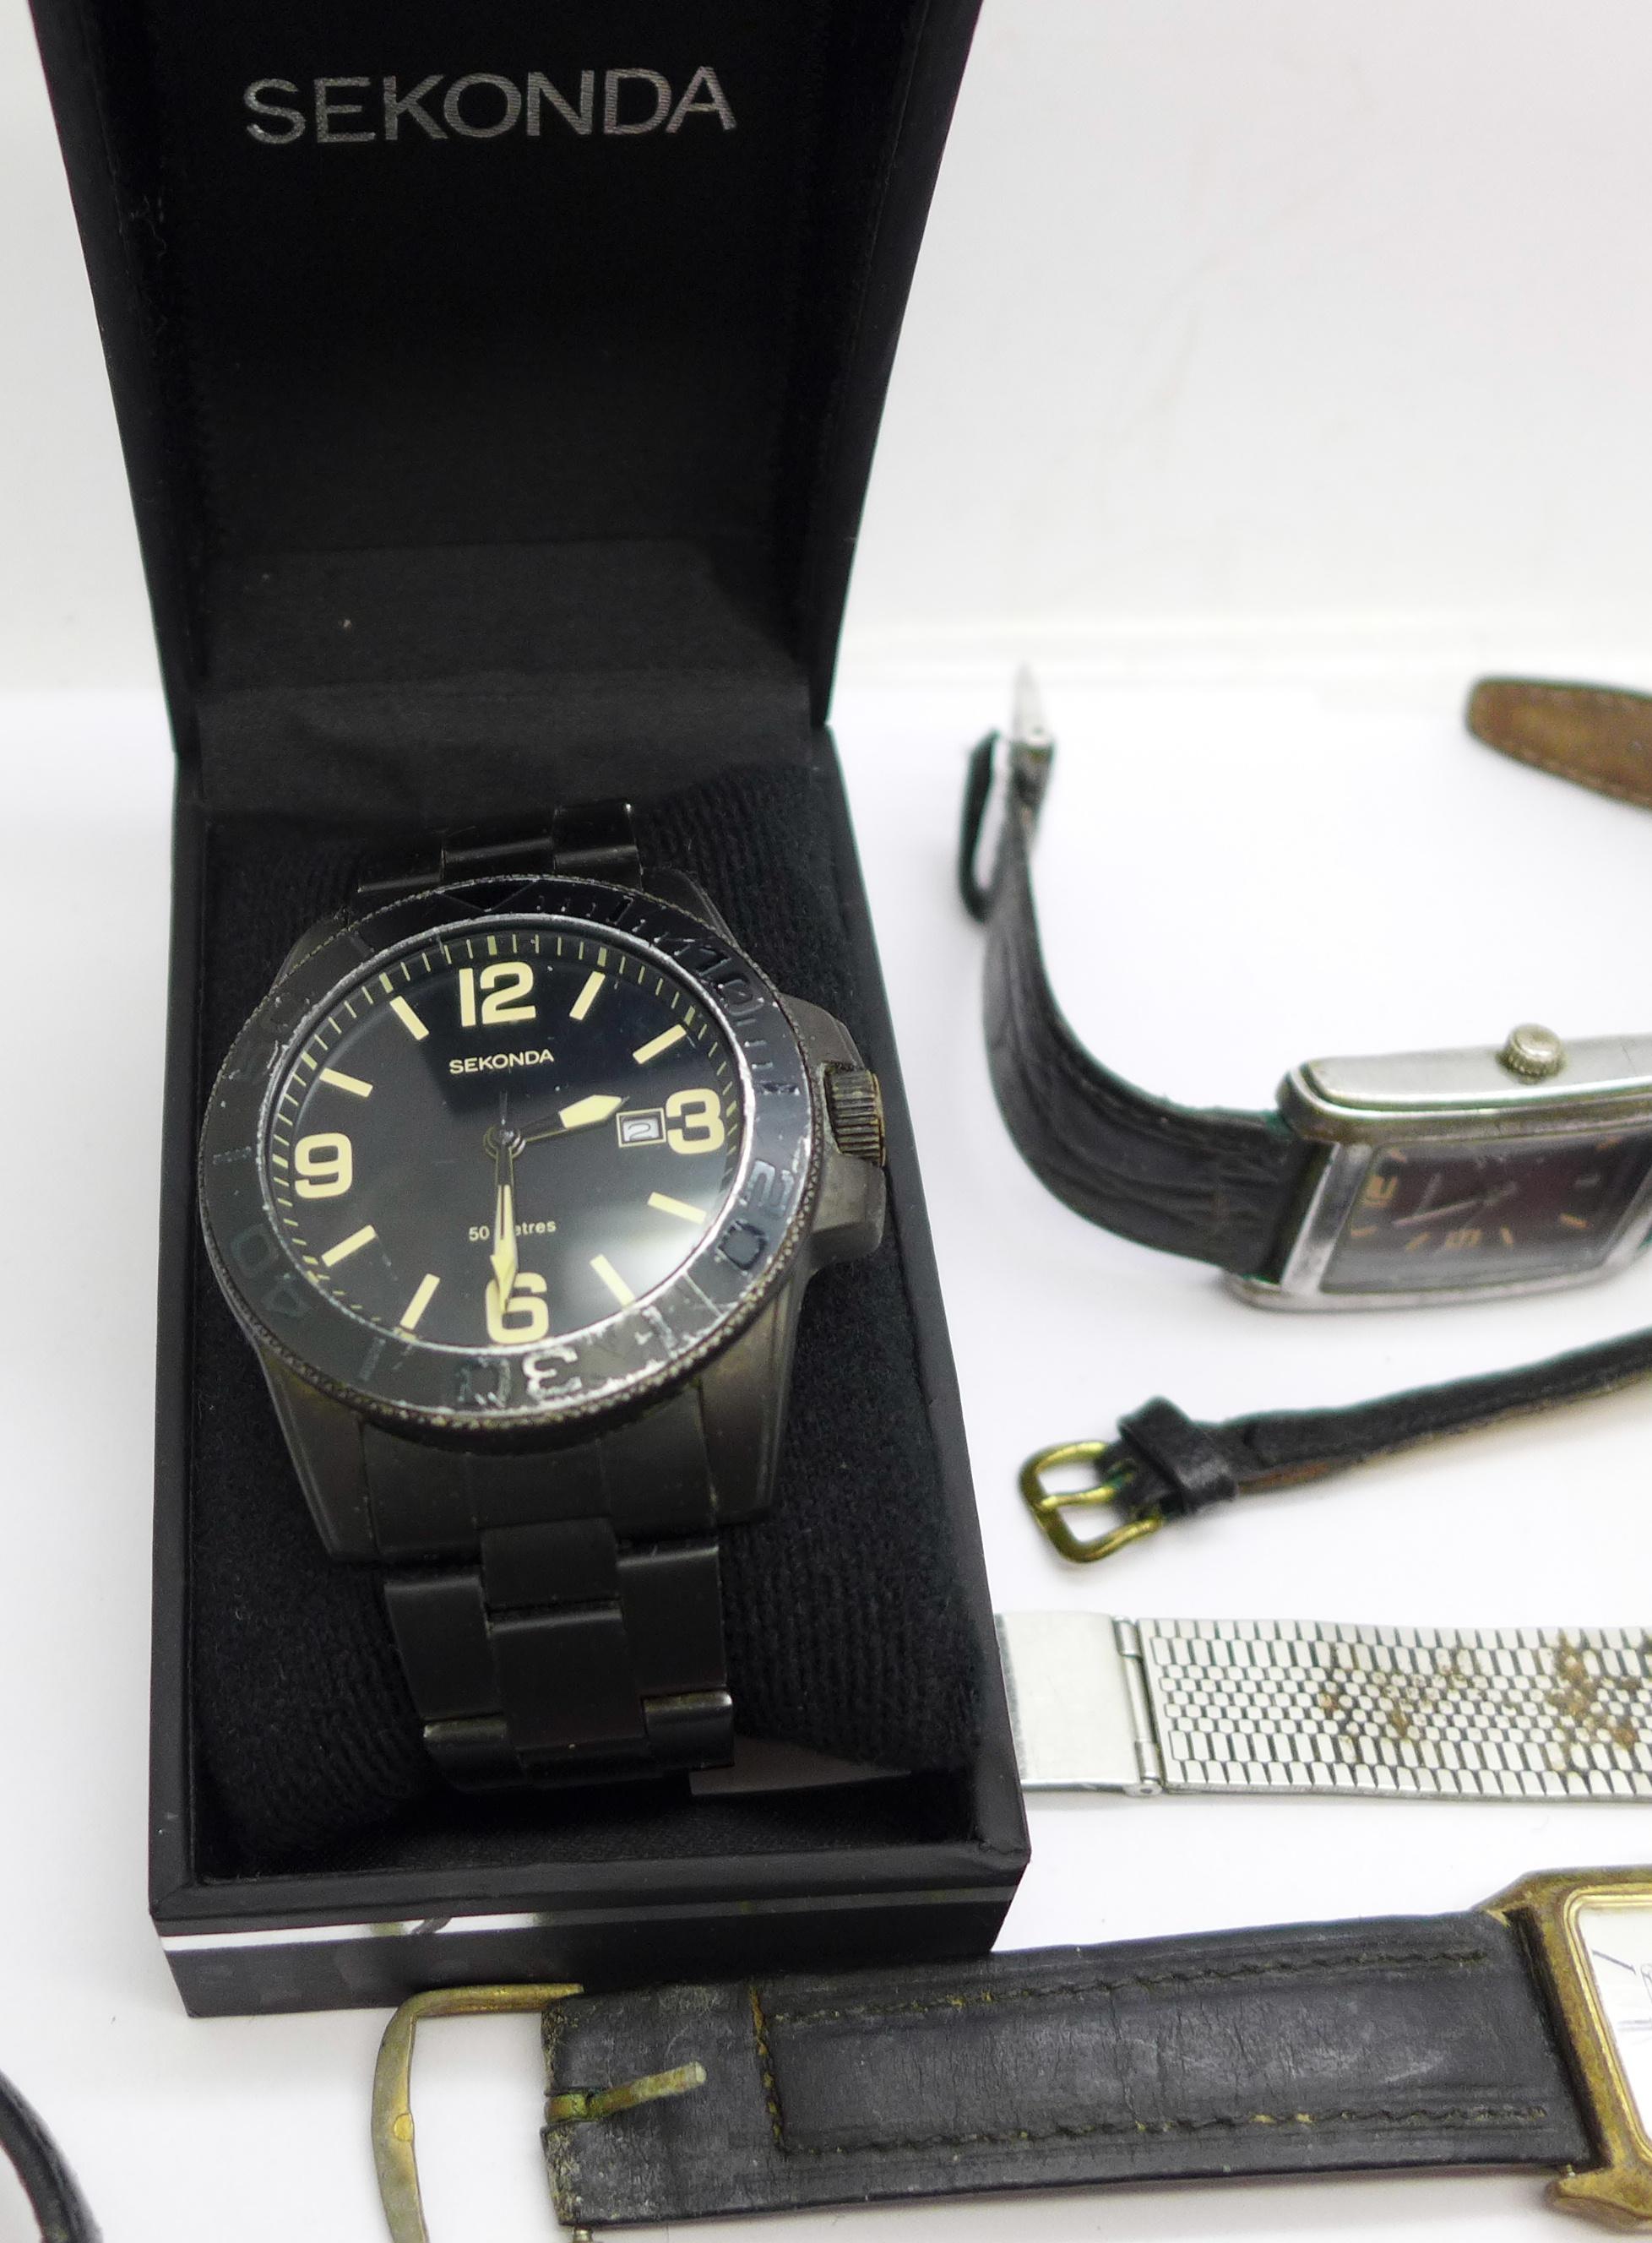 Wristwatches including Sekonda, Seiko, Ingersoll, Rotary, etc. - Image 5 of 5